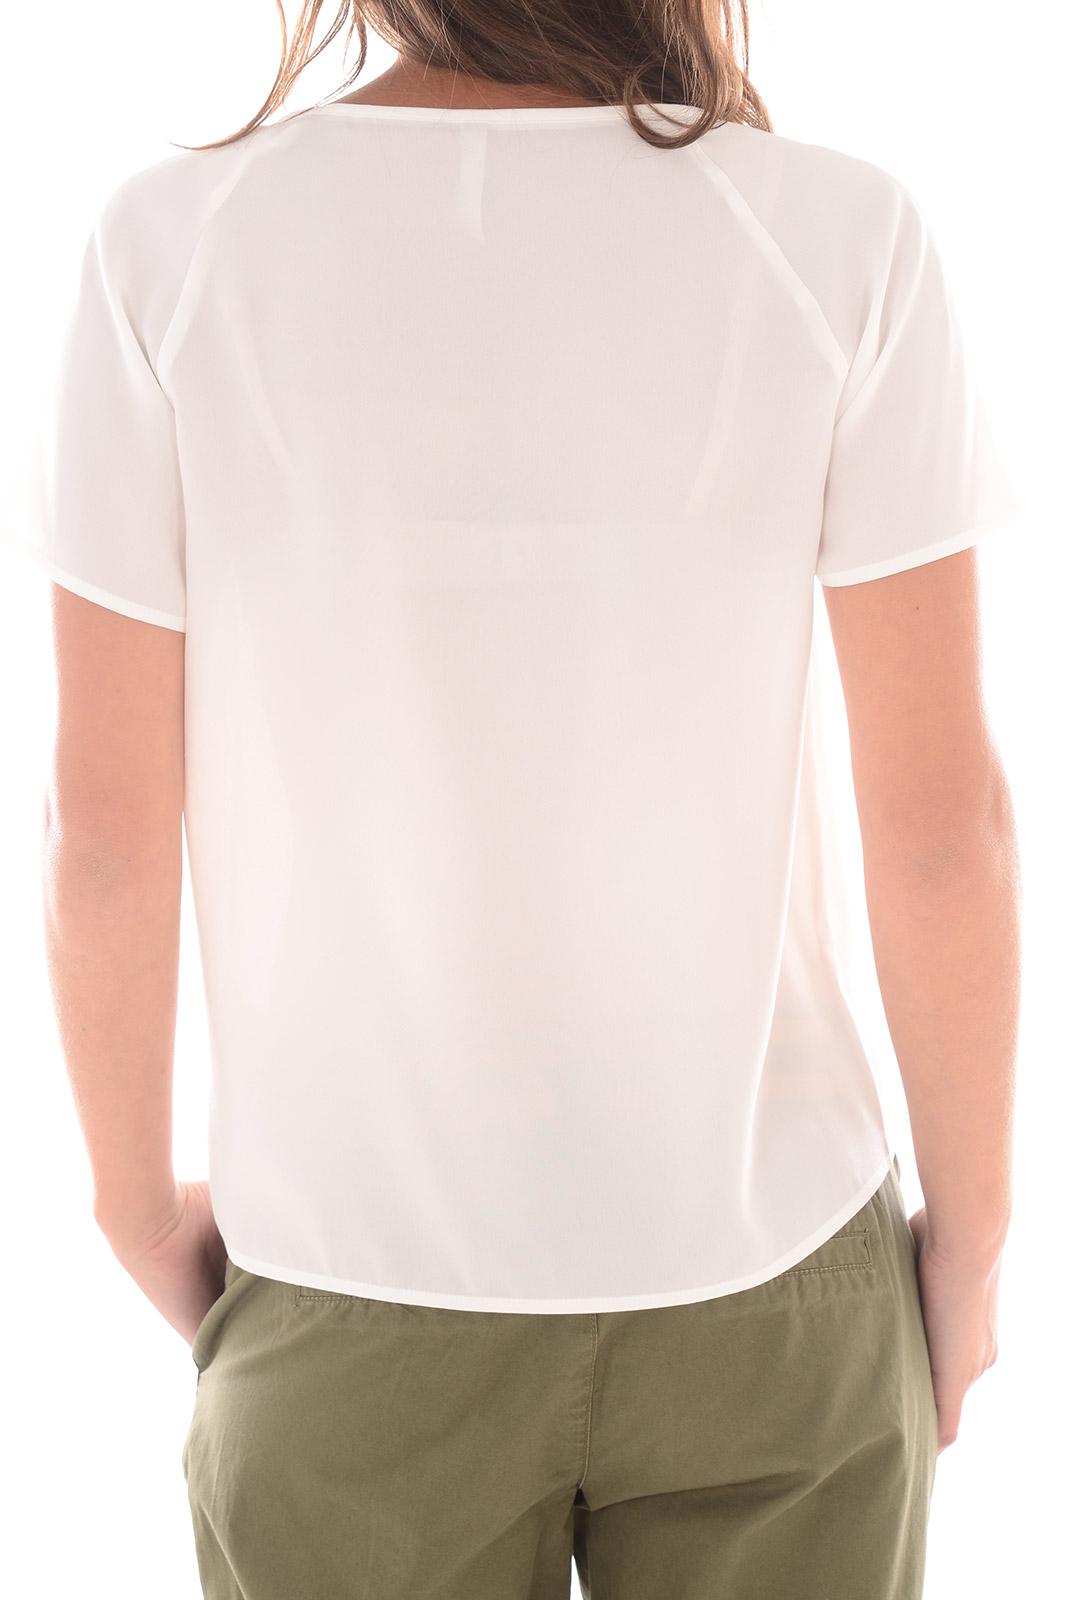 Tee shirt  Pepe jeans PL301242 SESSA RT 934 SILVER